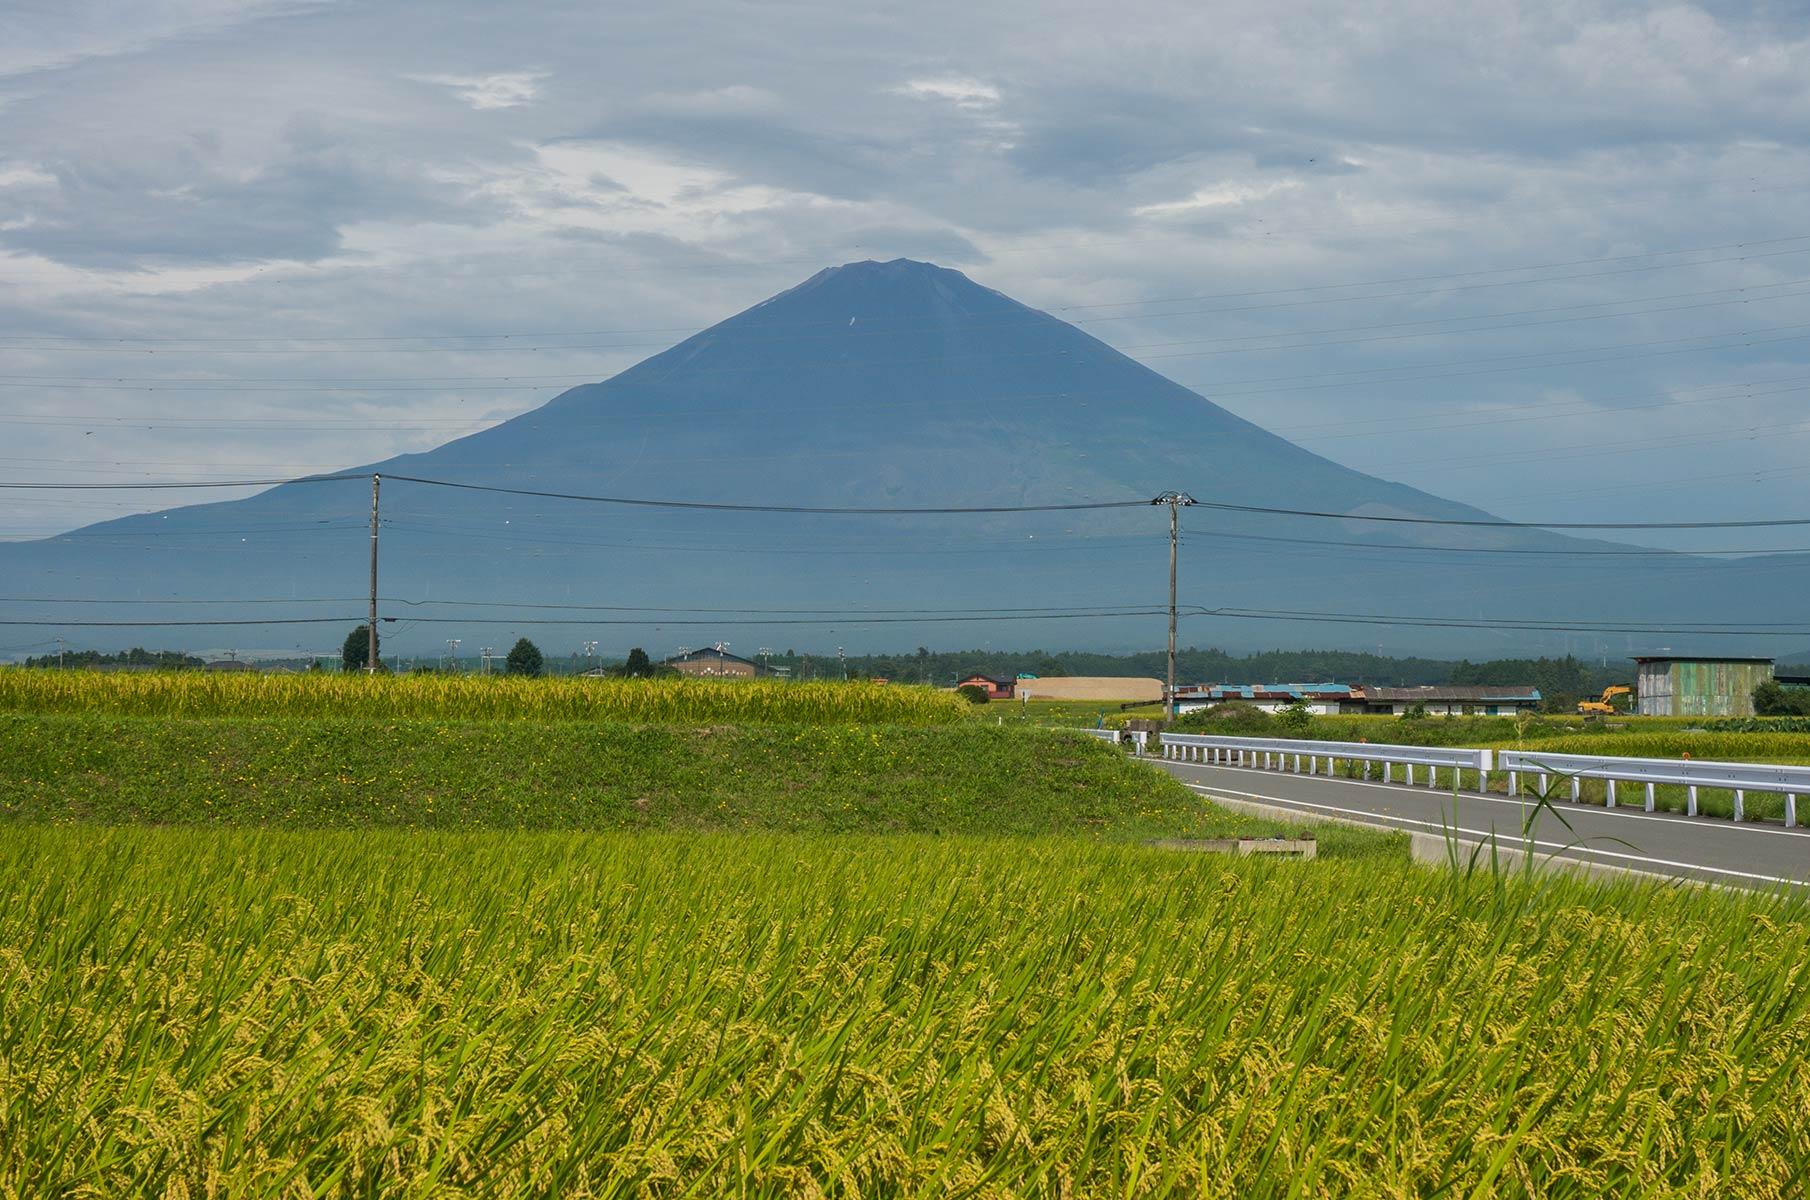 Mt. Fuji auf der Insel Honshū in Japan